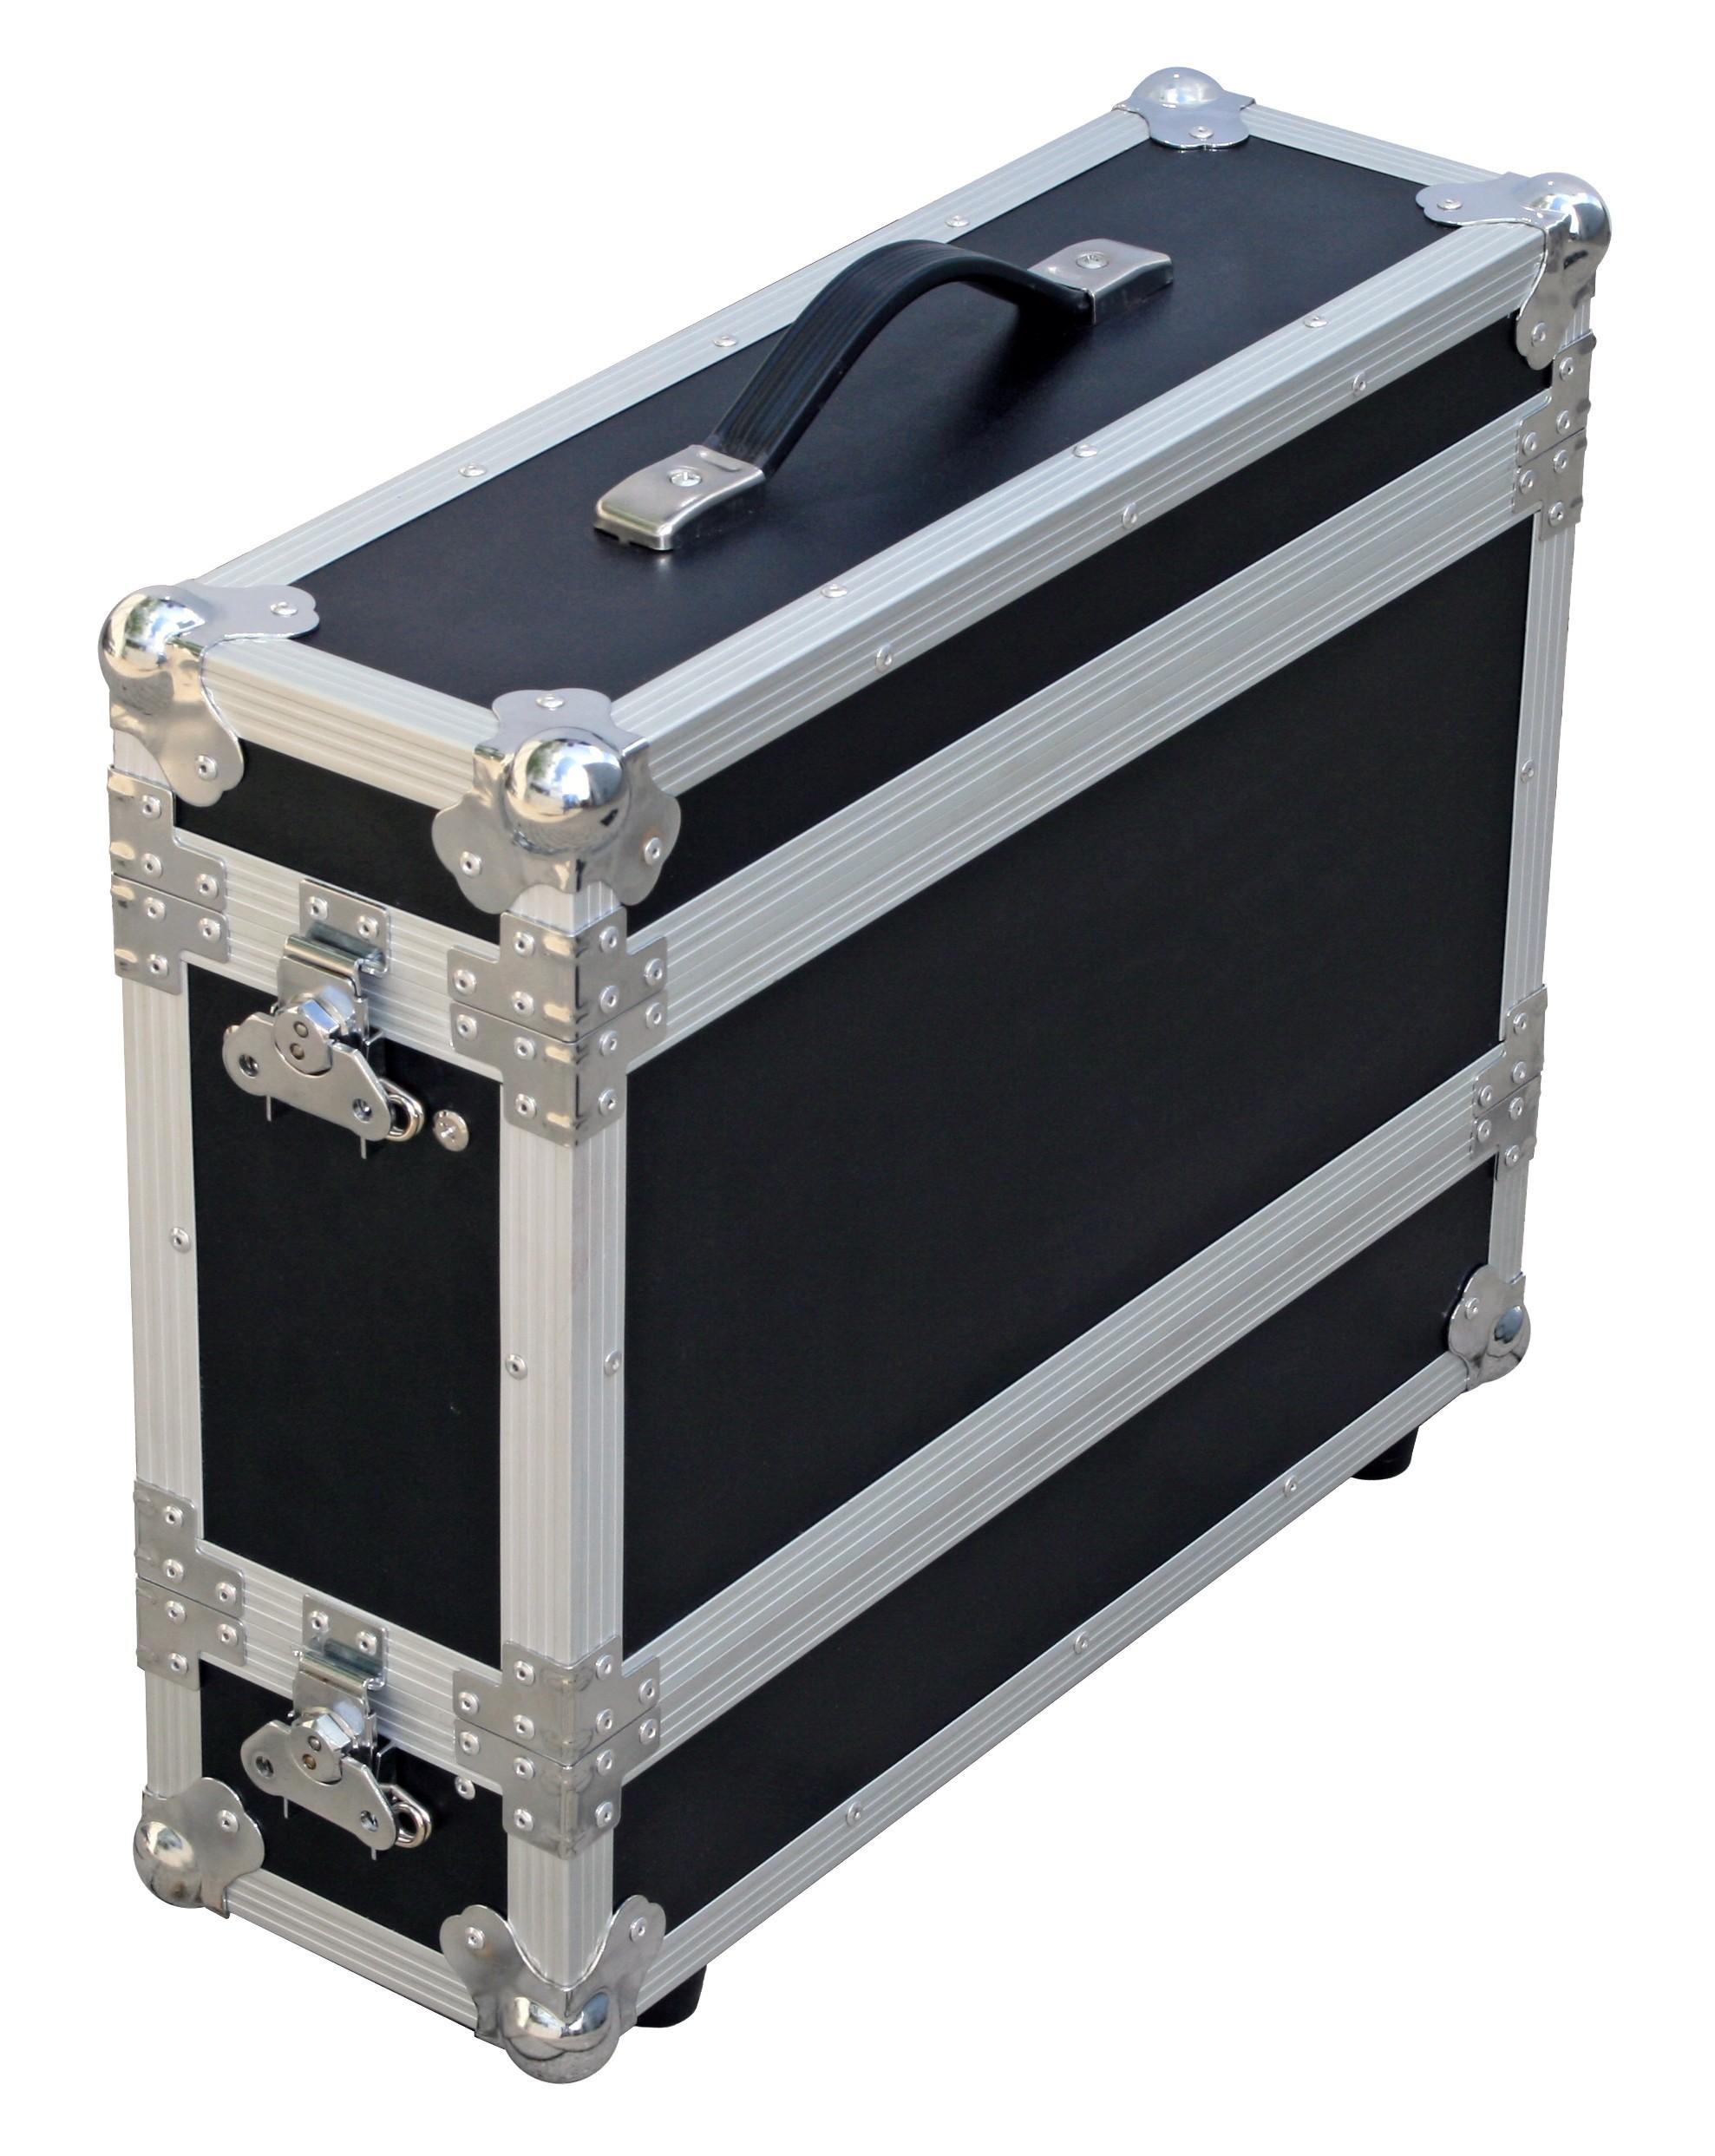 Jv Case Micro Case 3u 03221 99 00 Be 03221